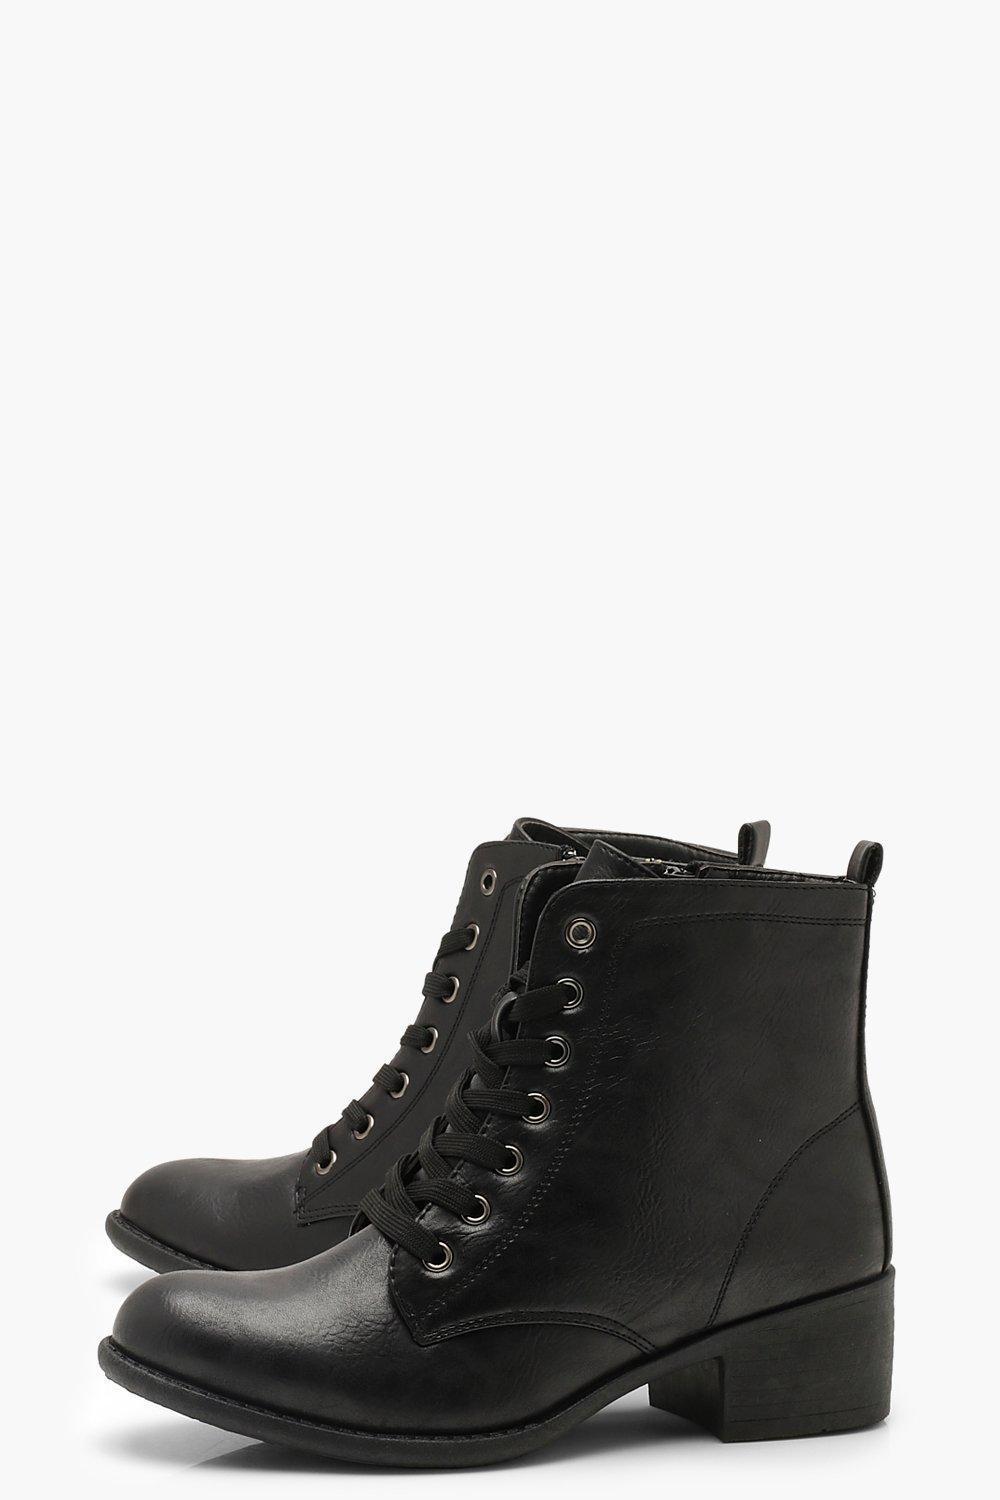 30aa8cc77a2 Lyst - Boohoo Lace Up Block Heel Hiker Boots in Black